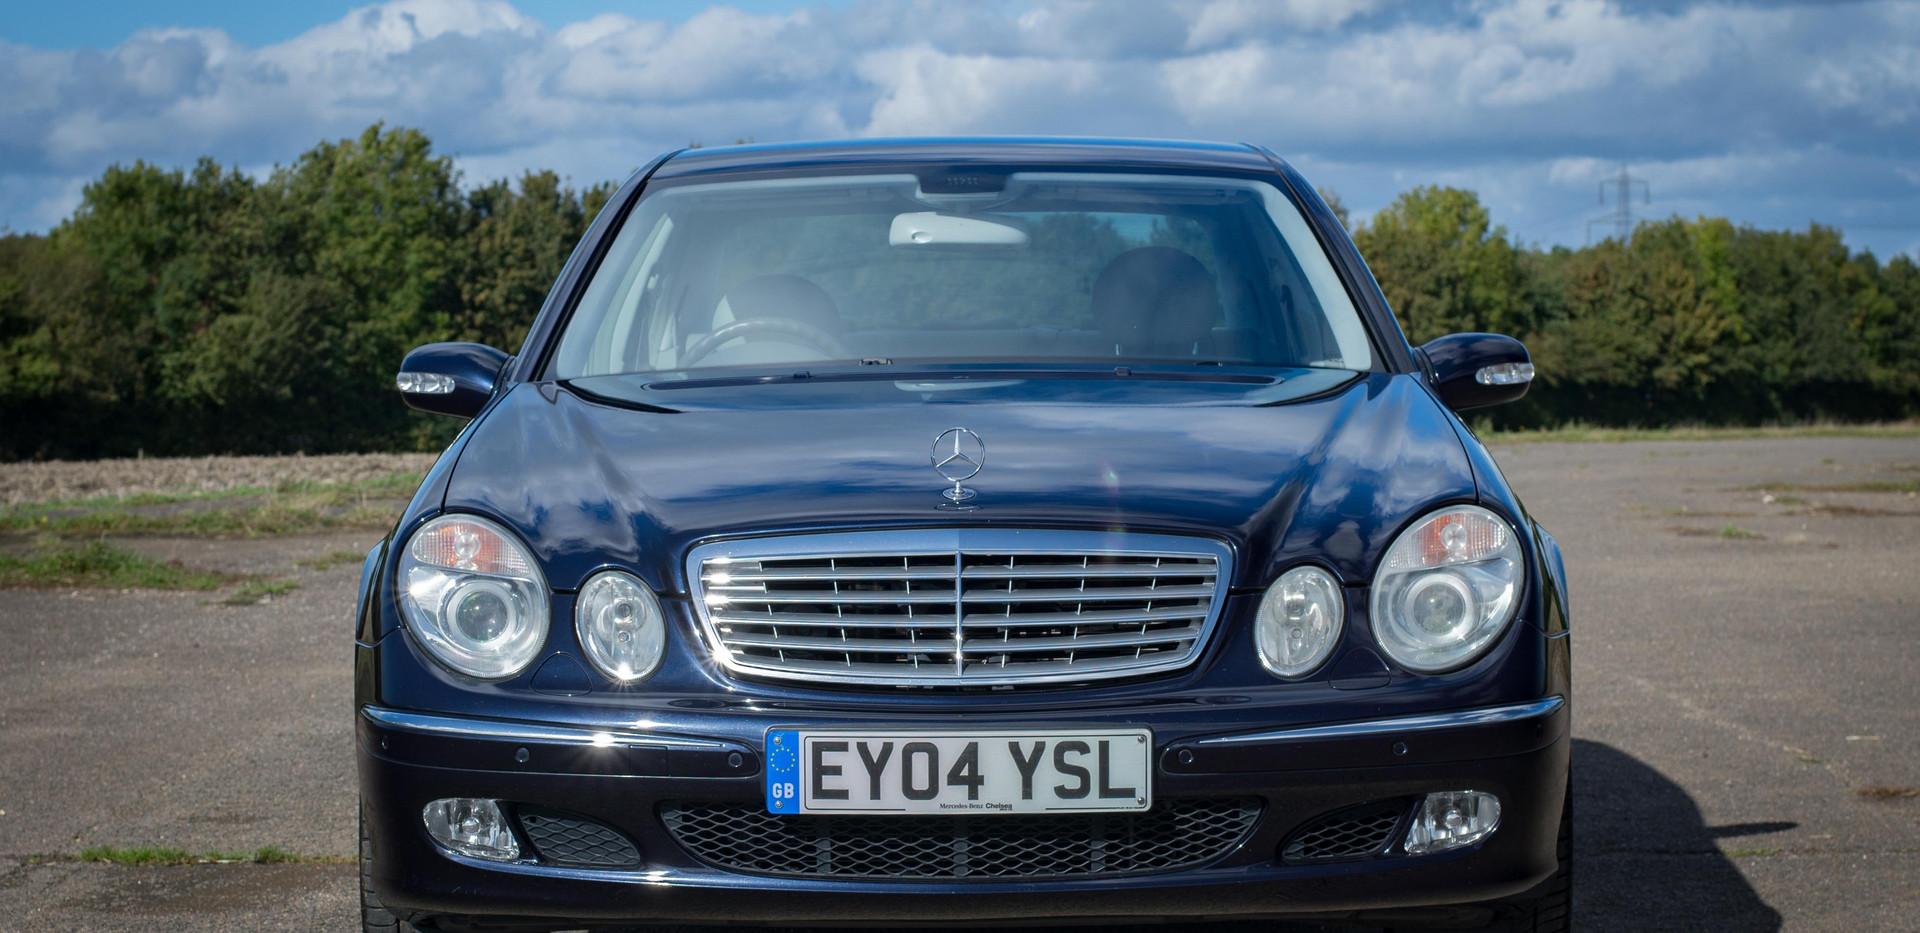 Mercedes E500 For Sale UK London  (14 of